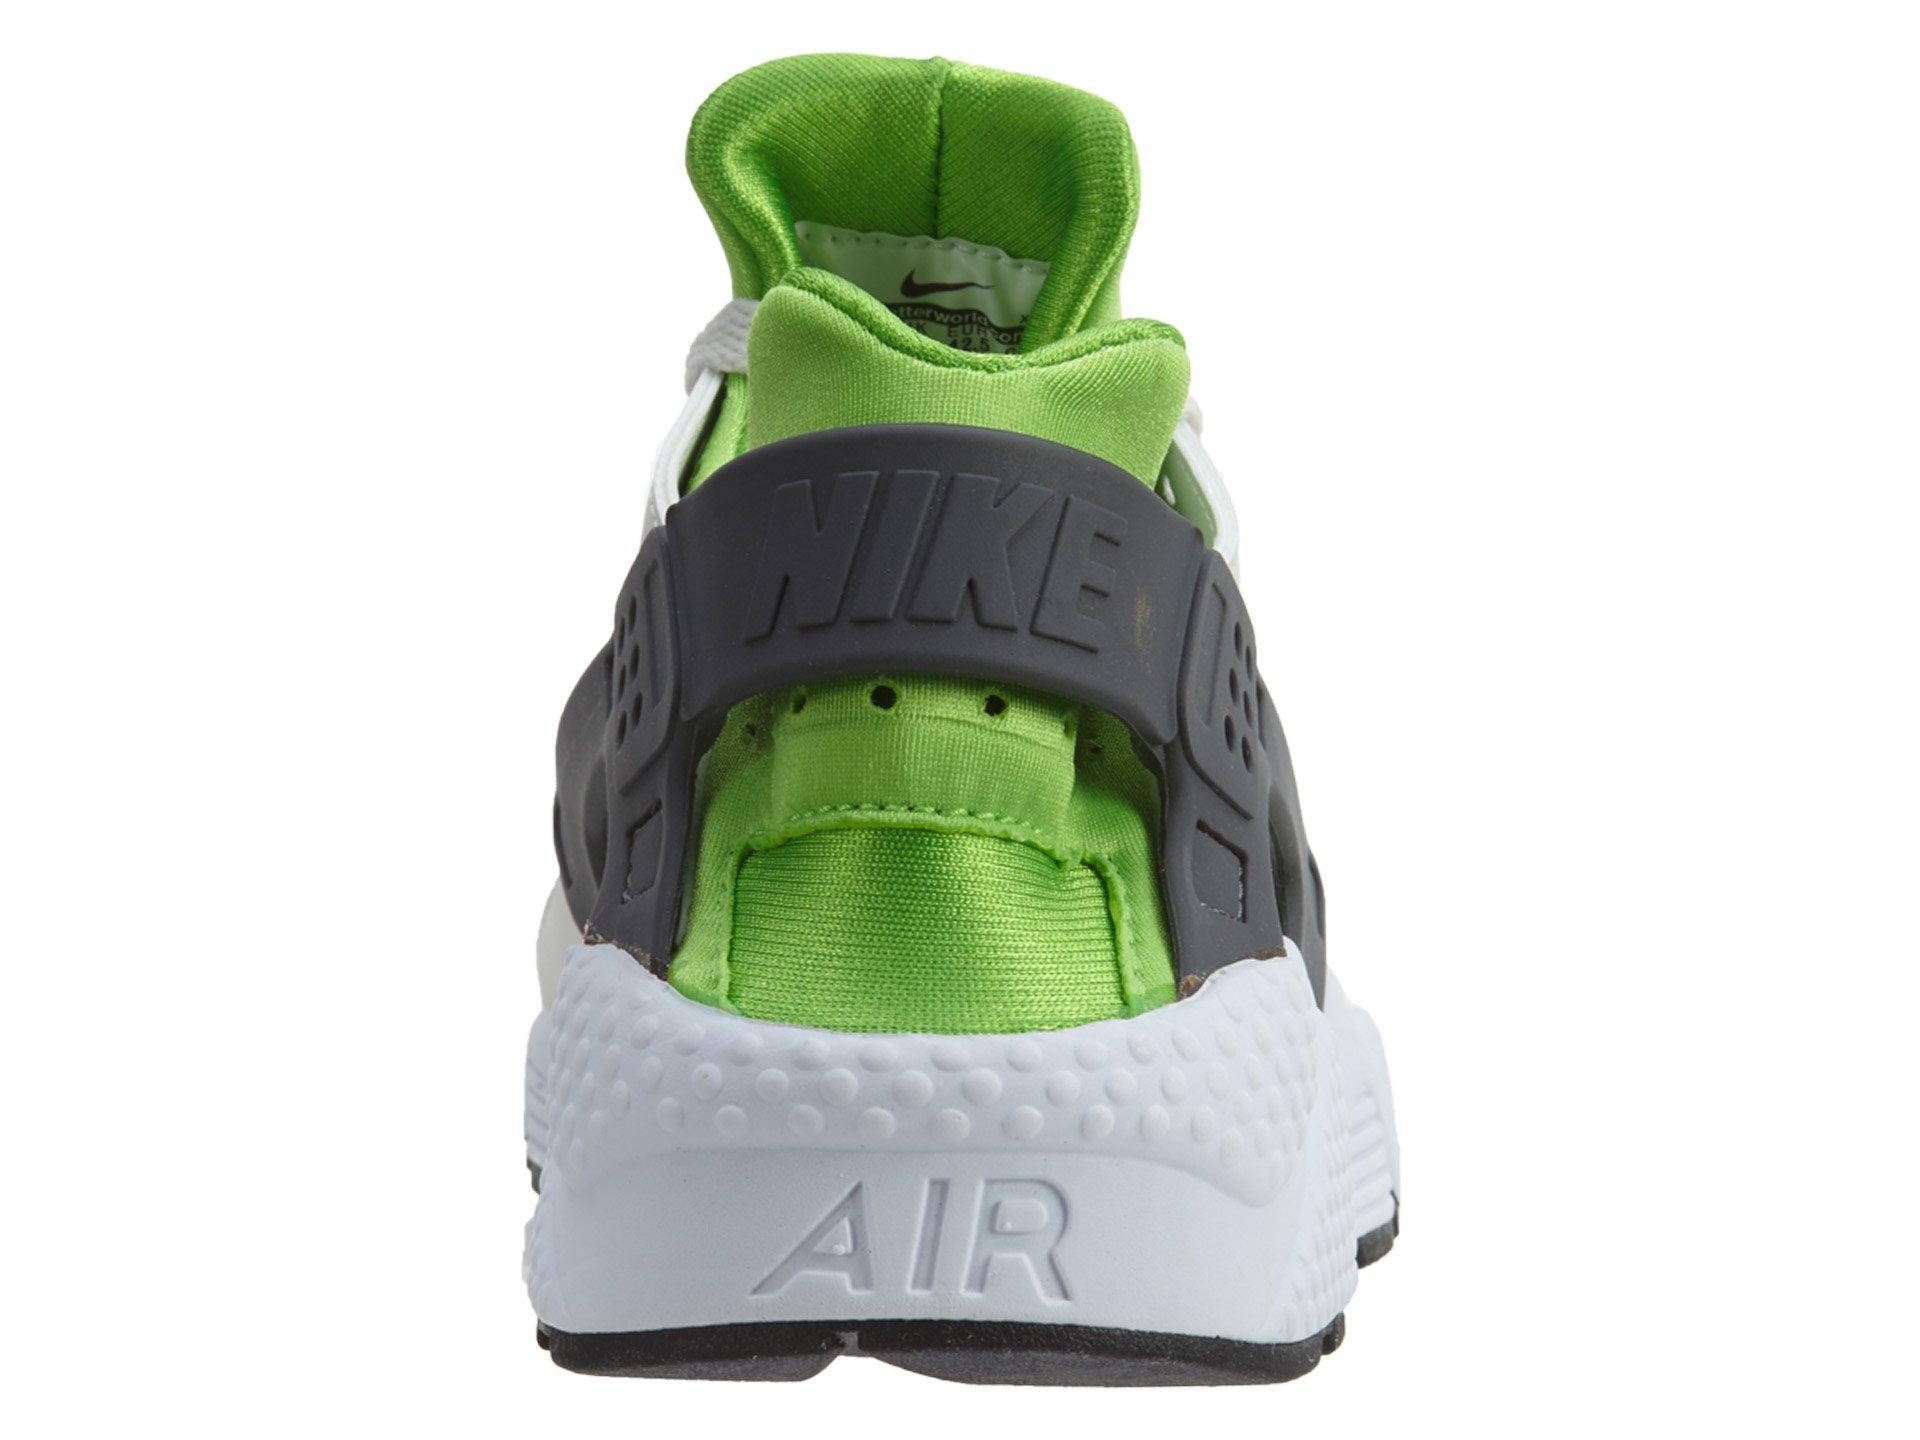 Nike Men's Air Huarache Actn Green/Vvd Orng Phntm Wht Running Shoe 10.5 Men US by NIKE (Image #3)